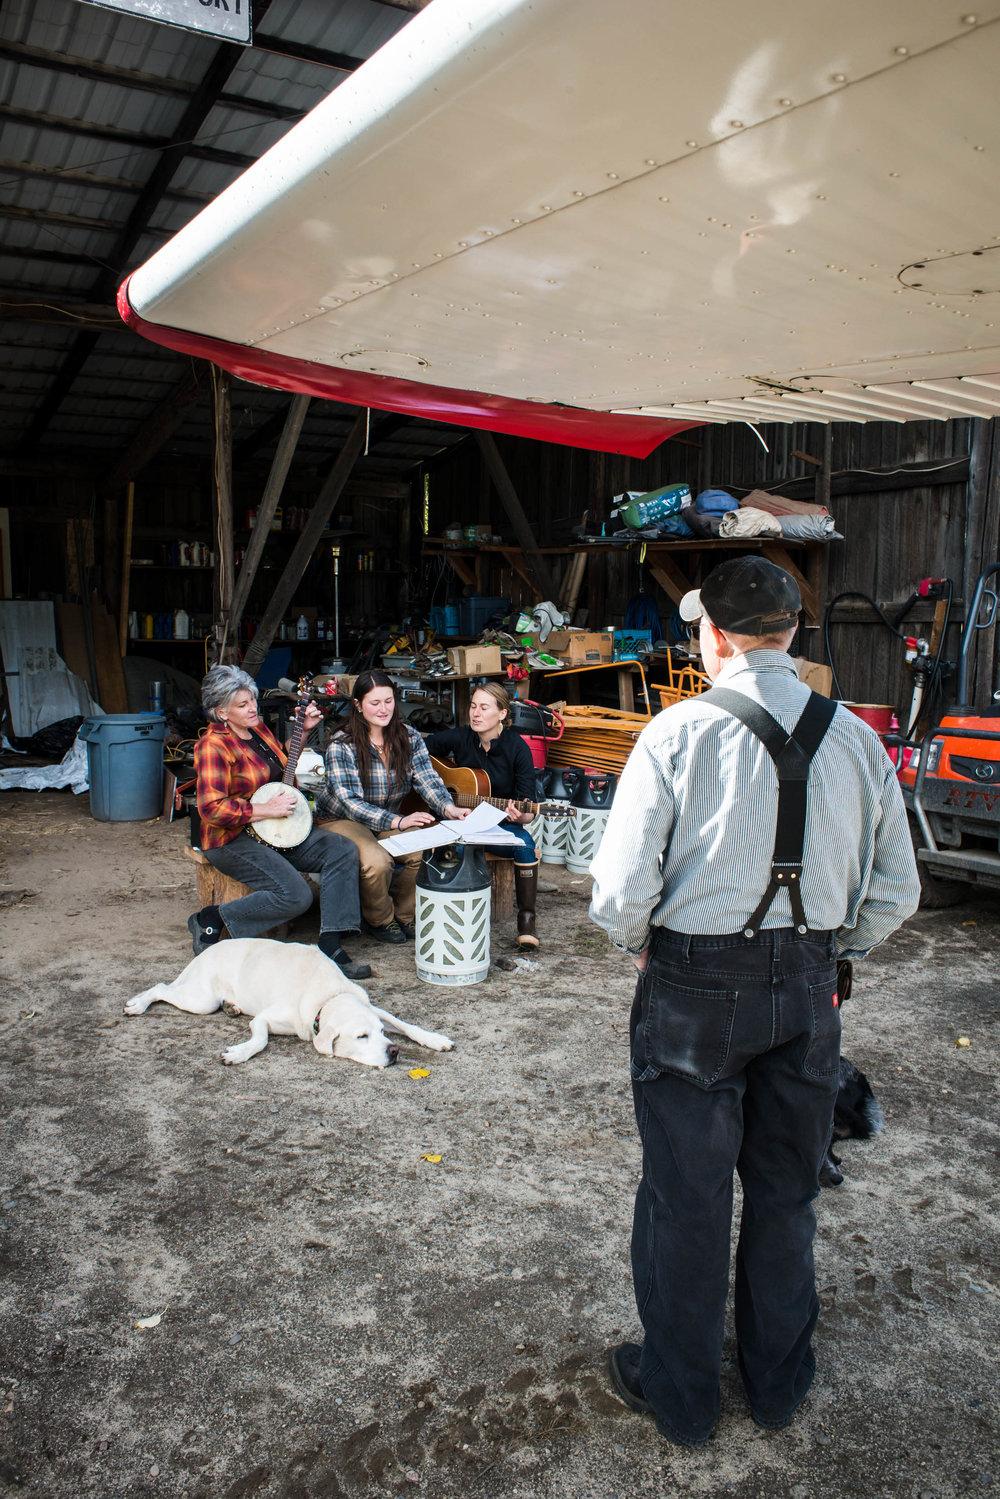 Minam_River_Lodge_Wallowa_Mountains_Eagle_Cap_Wilderness_Oregon_Autumn_2017_Please_Credit_Talia_Jean_Galvin-8.jpg